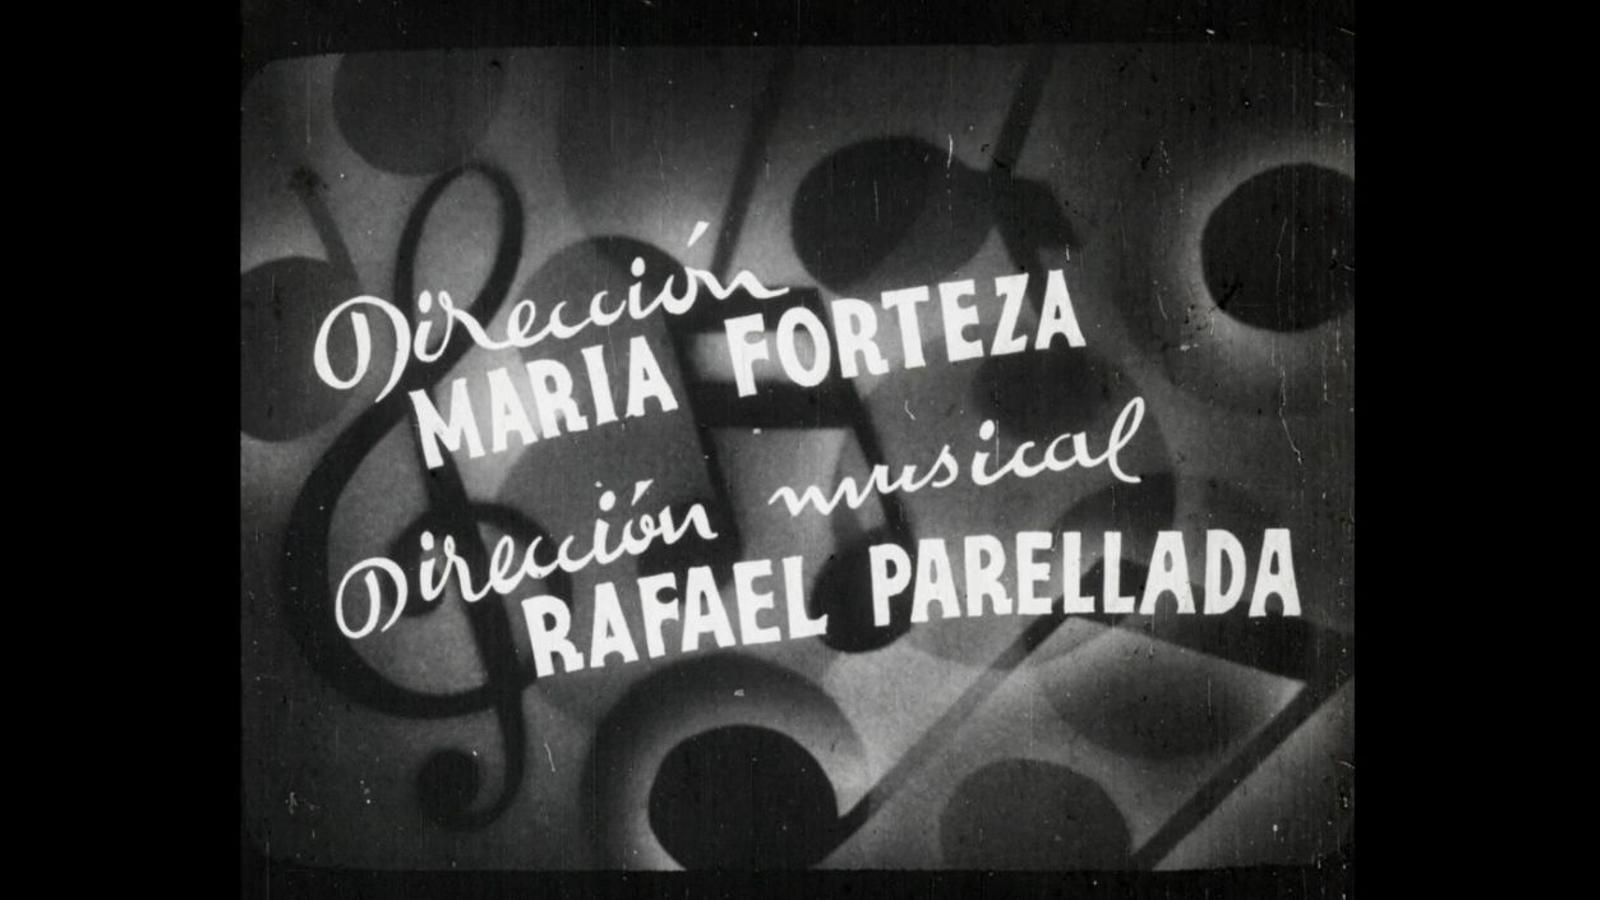 Fotograma de 'Mallorca', dirigida per María Forteza